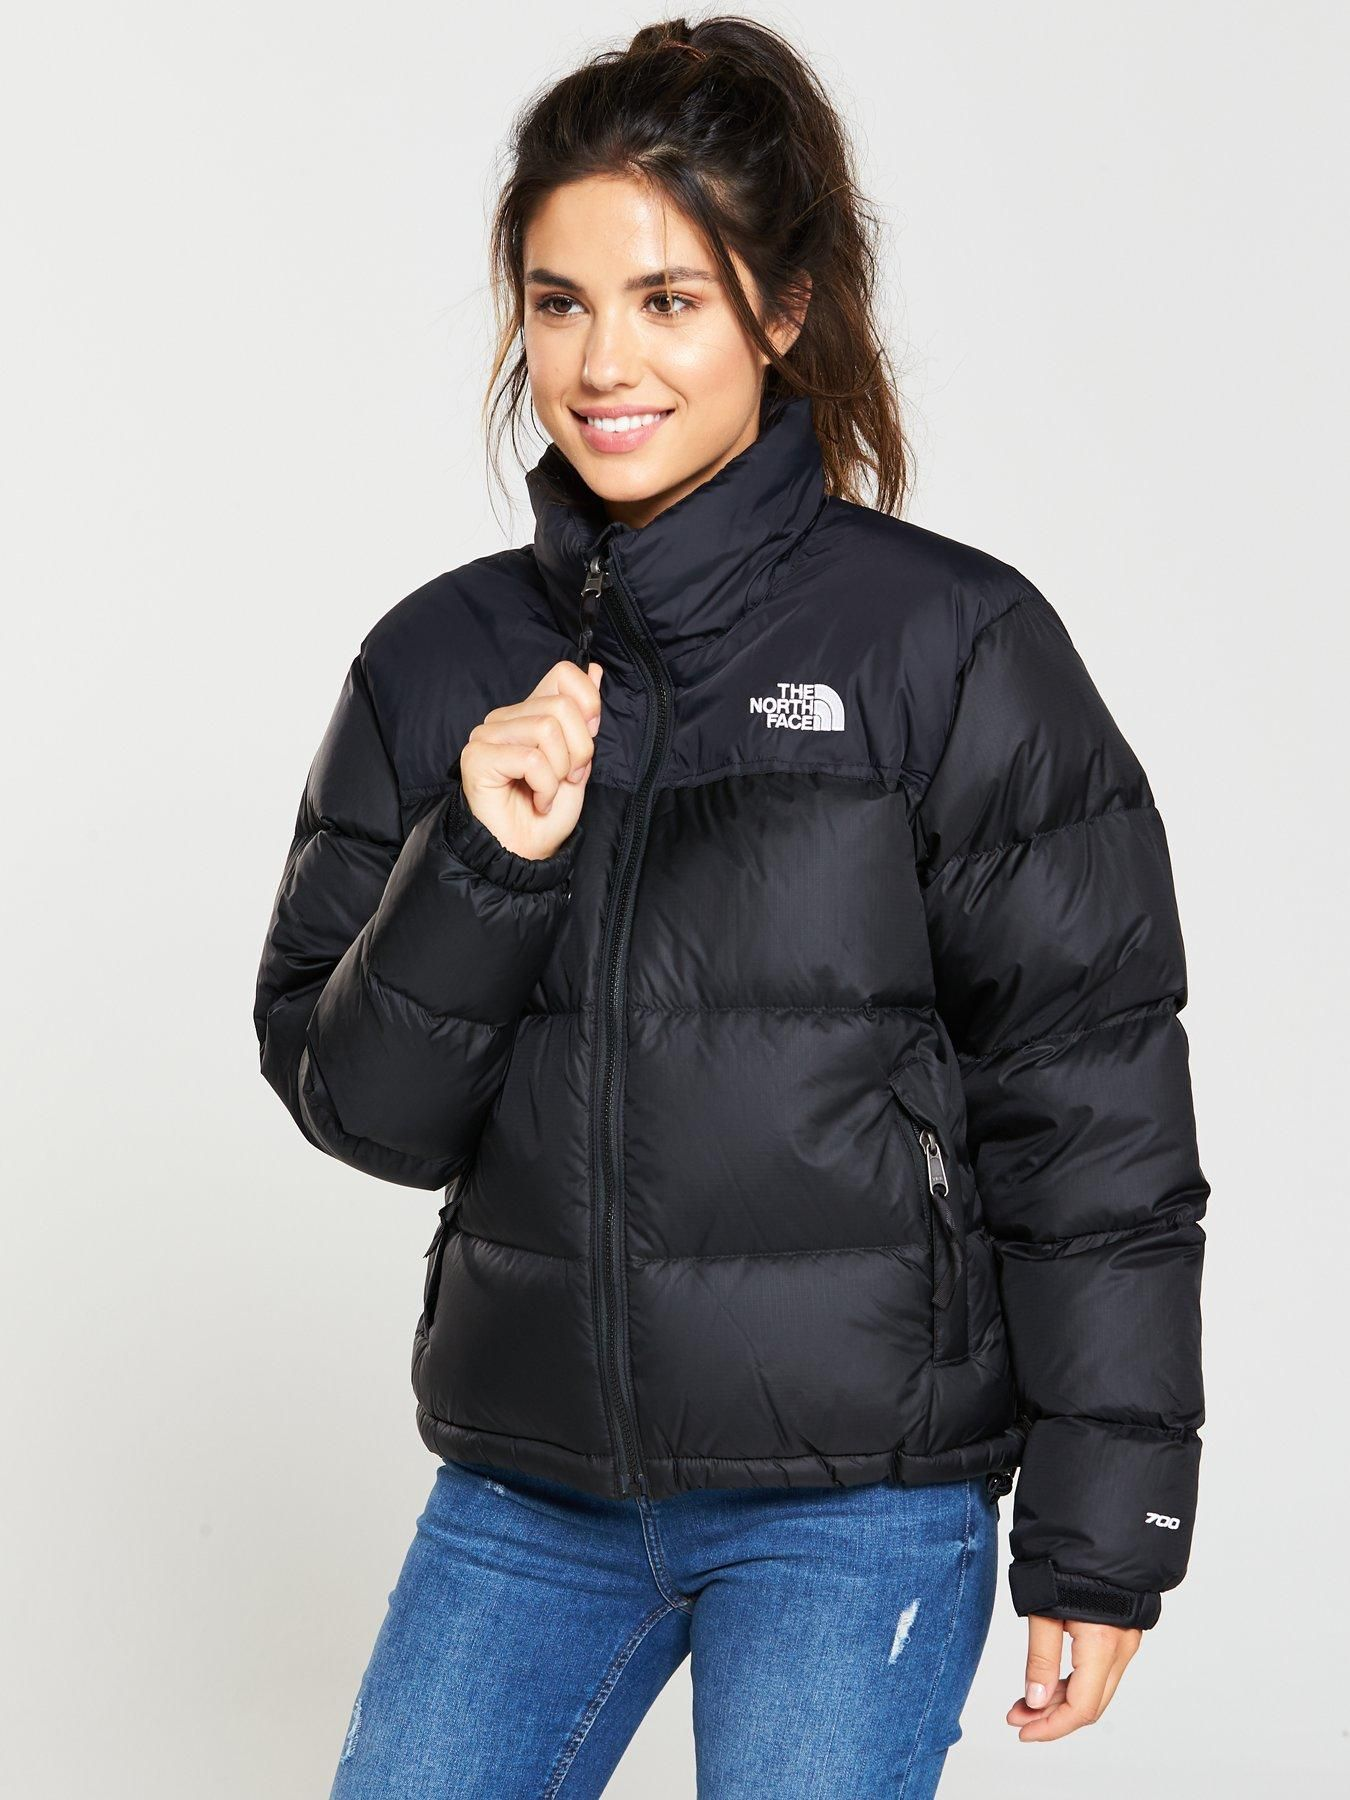 1996 Retro Nuptse Jacket Black North Face Outfits North Face Coat North Face Puffer Jacket